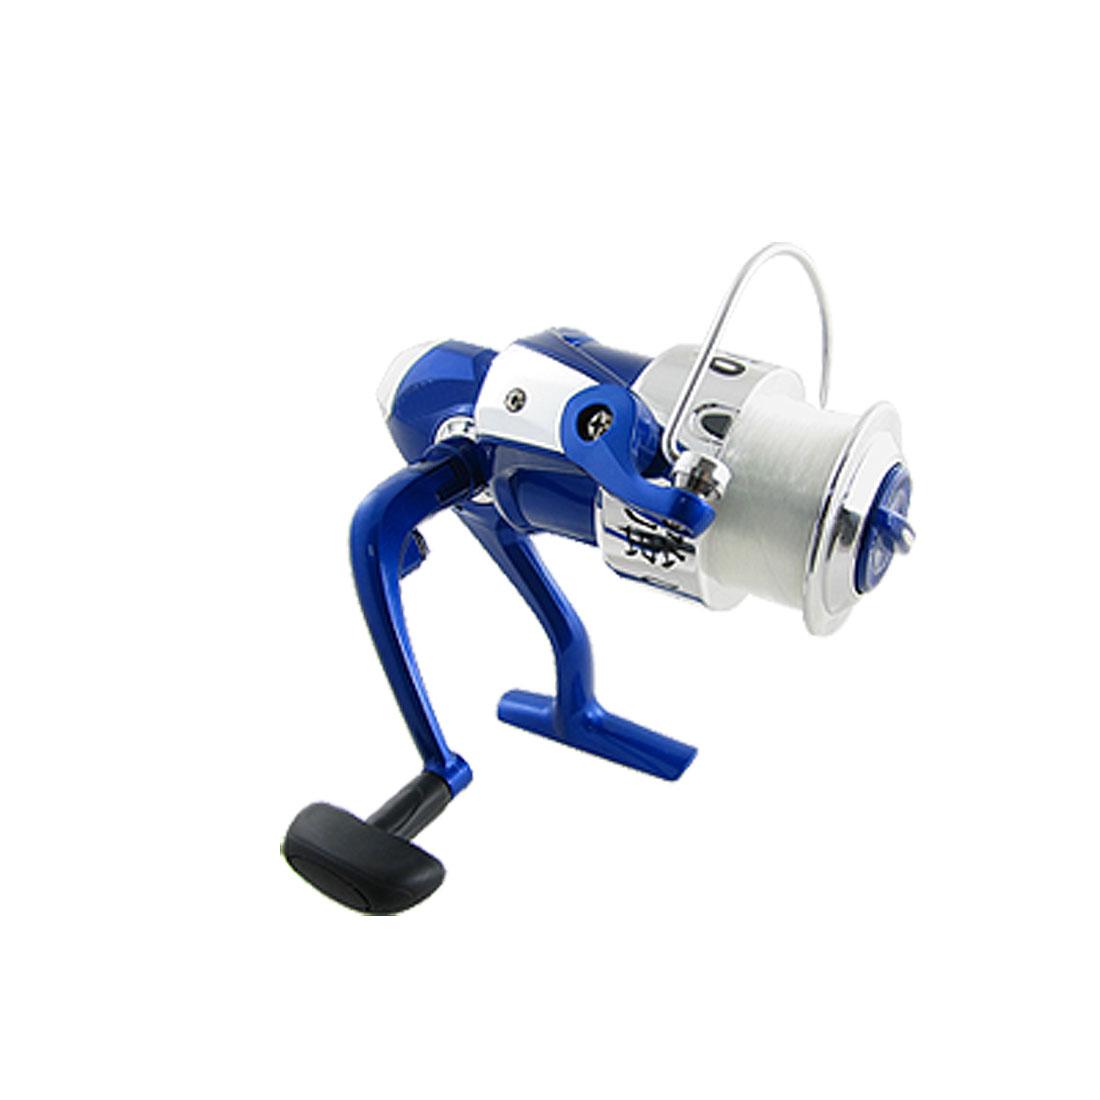 Anti-reverse Lever Gear Ratio 4.7:1 Fishing Spinning Reel